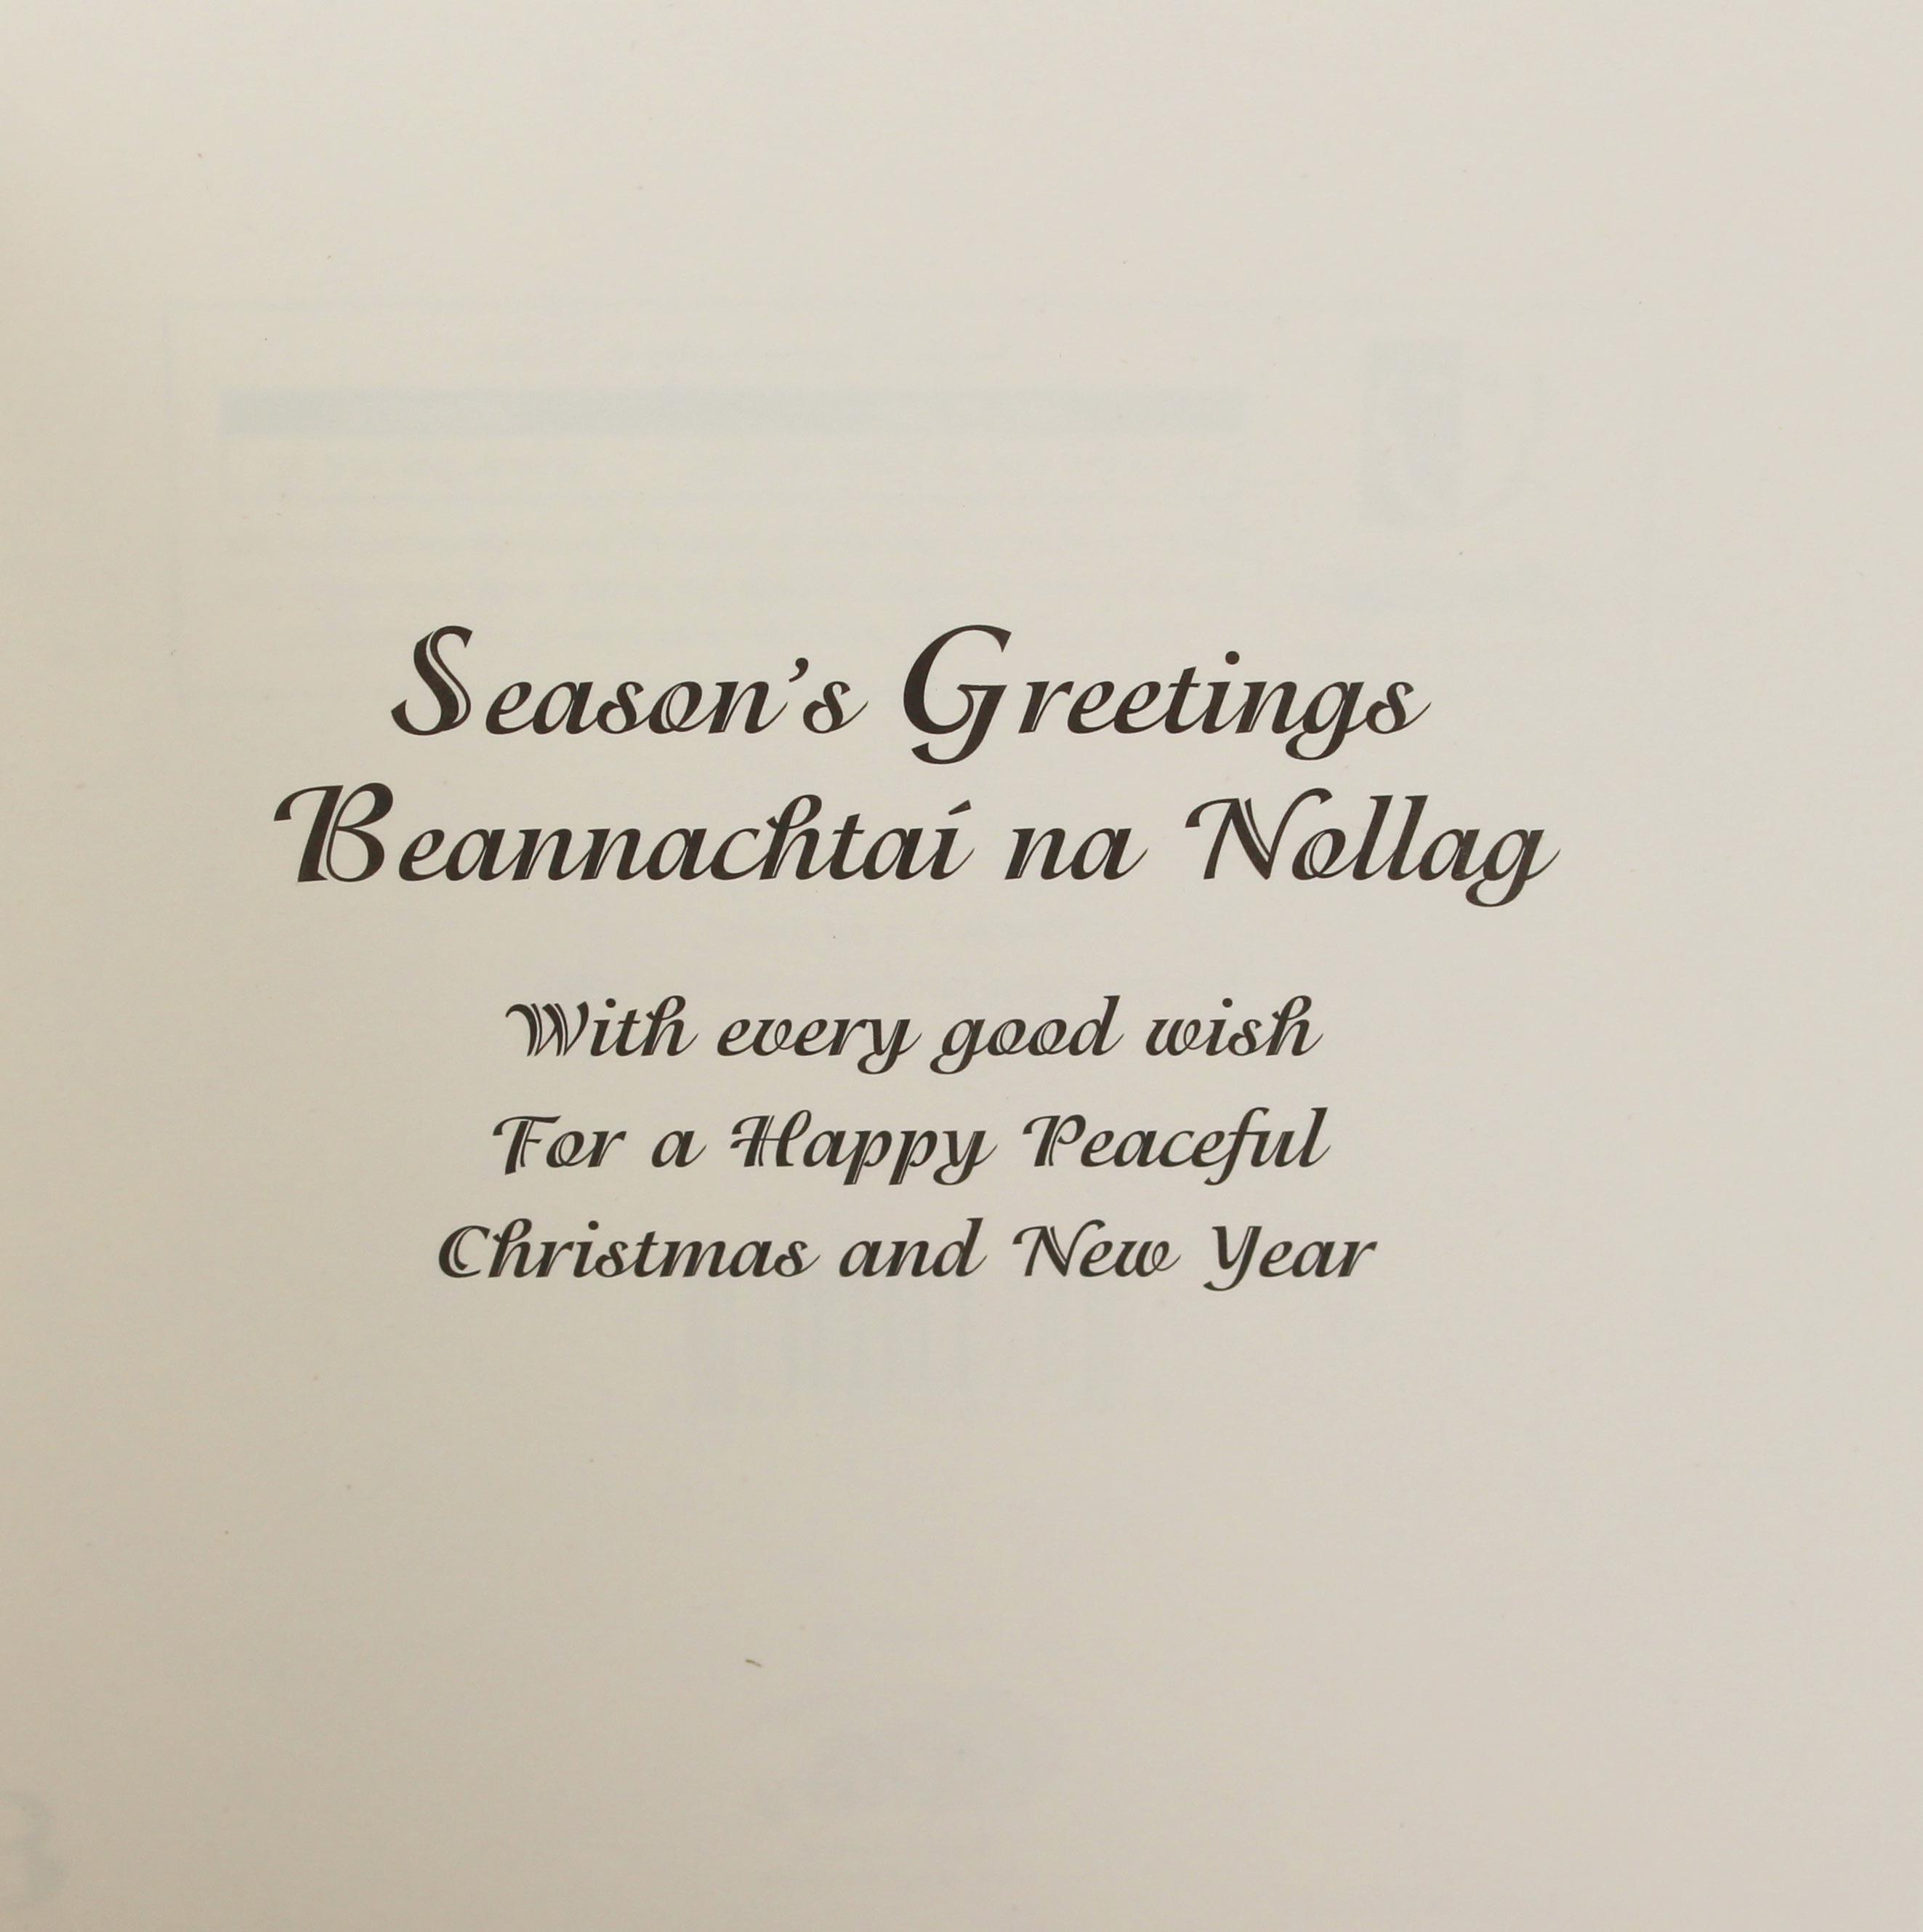 Christmas Card Greetings.Nollaig Christmas Cards Pack Of 10